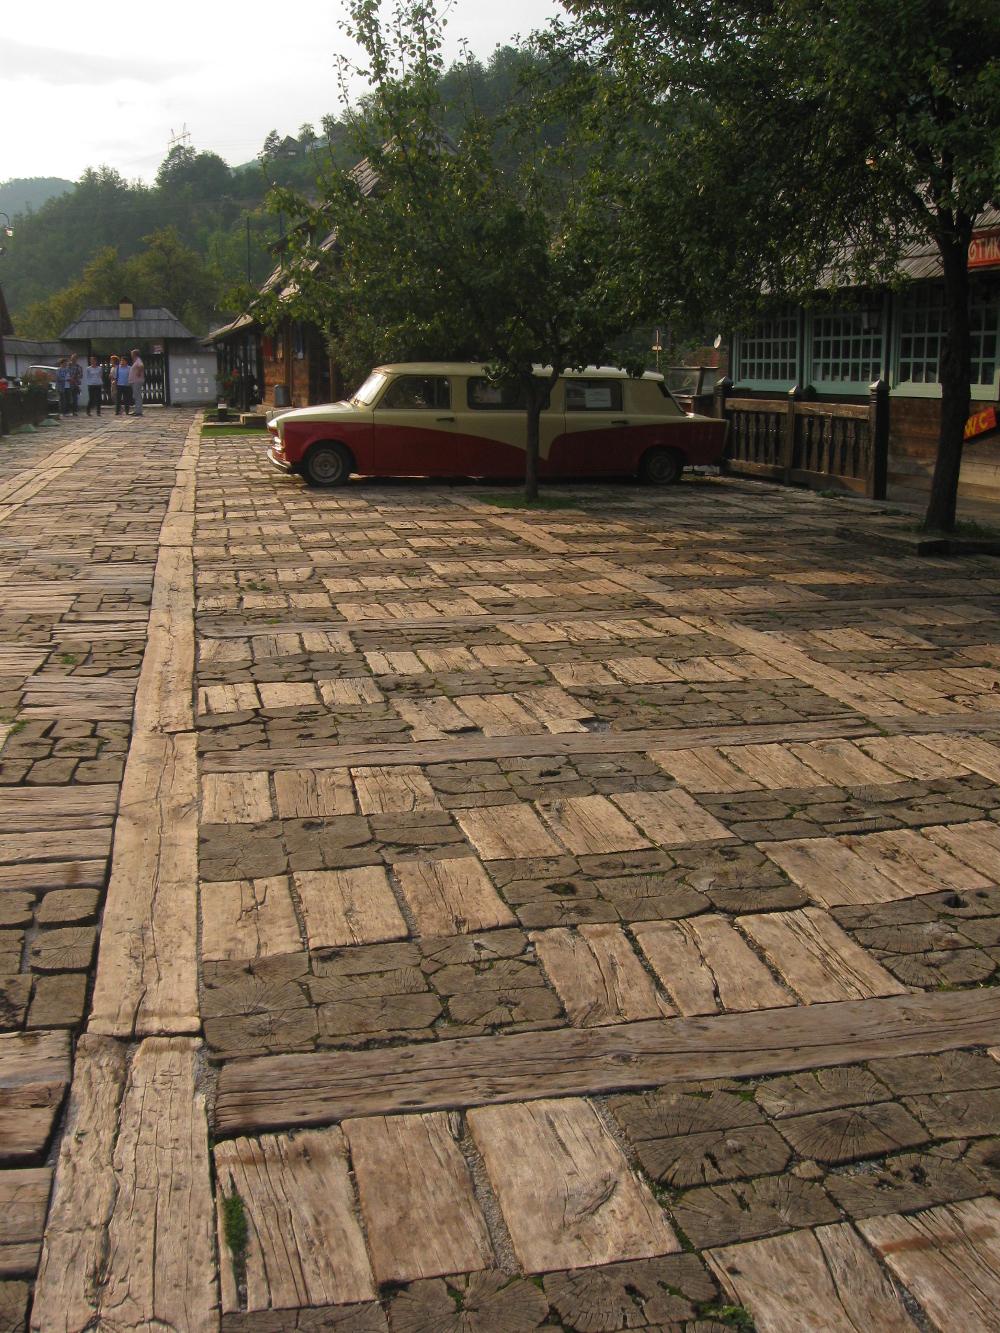 Interesantno rešenje popločavanja u Drvengradu